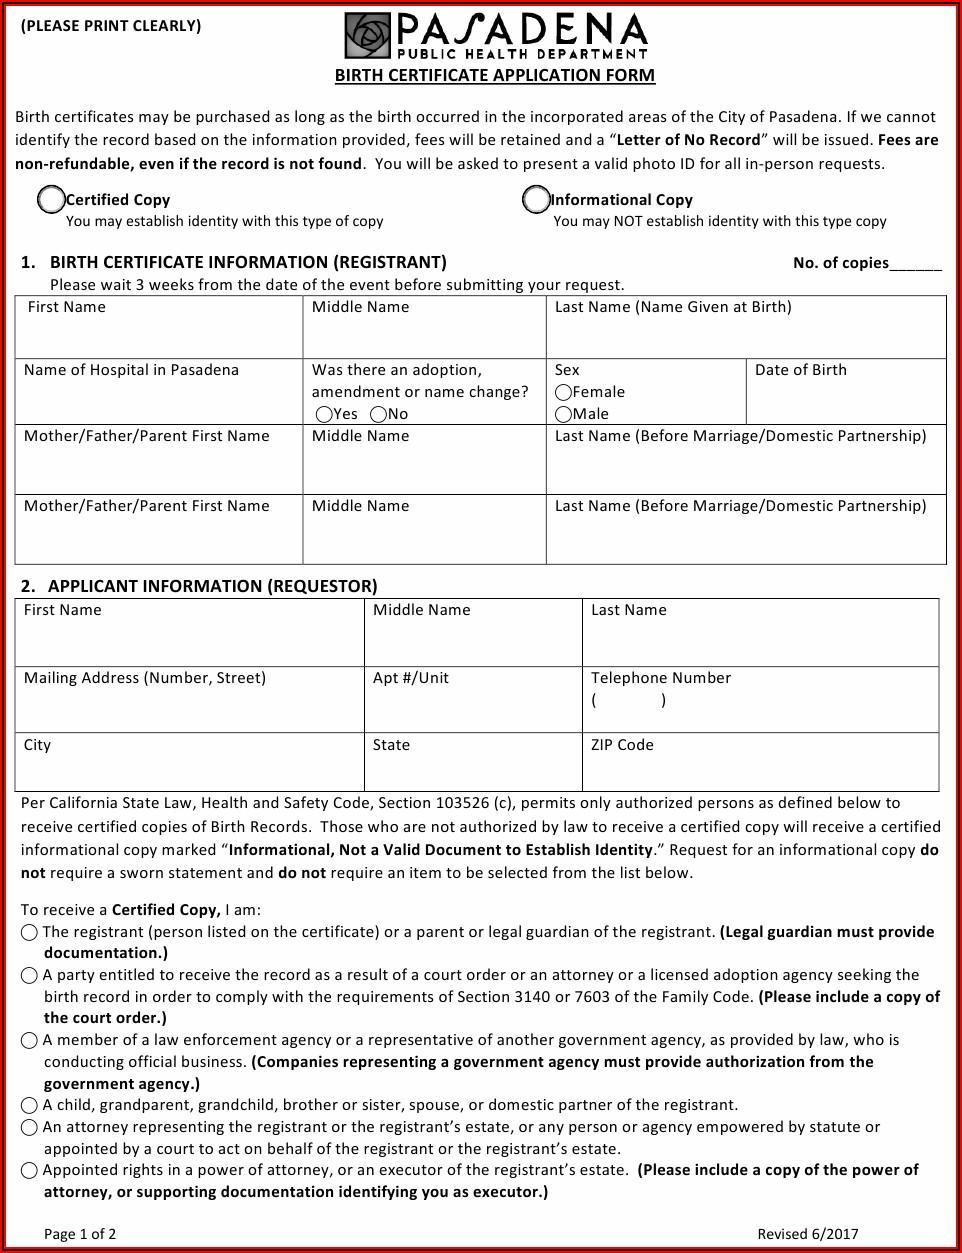 California Birth Certificate Application Form